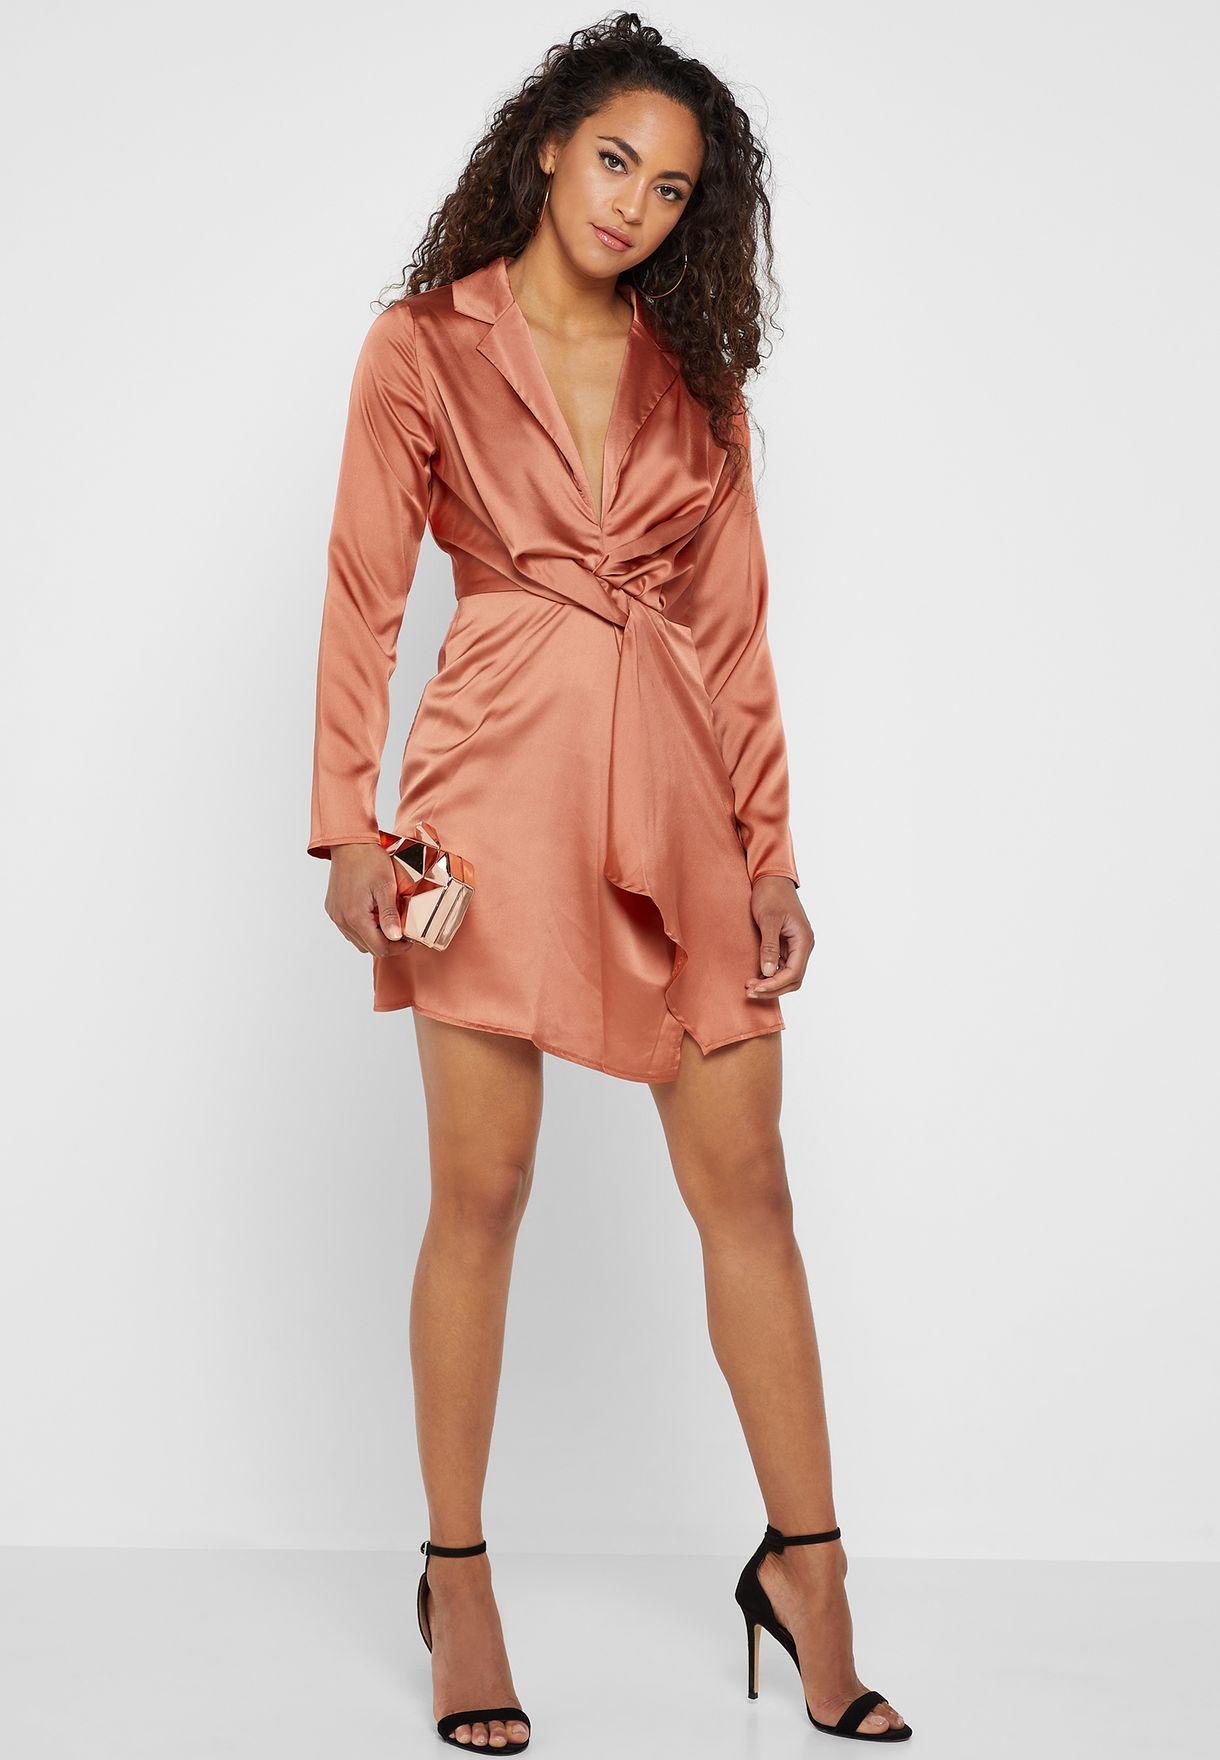 f72ab636f3 Shop Missguided orange Slinky Plunge Wrap Shift Dress DE925152 ...